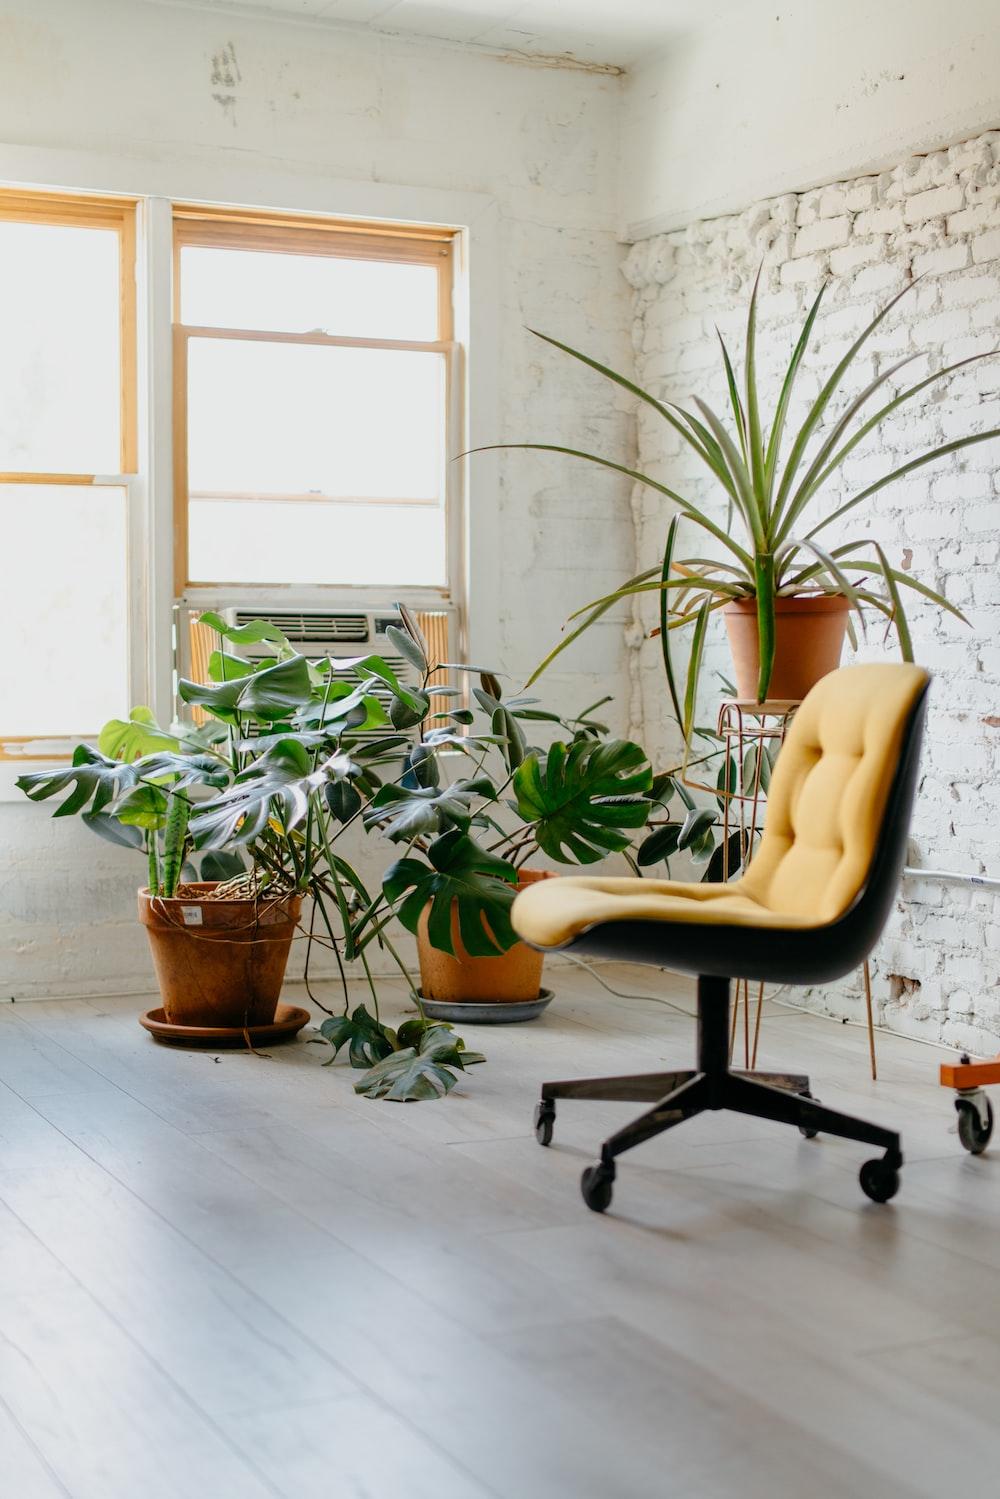 yellow rolling chair near window